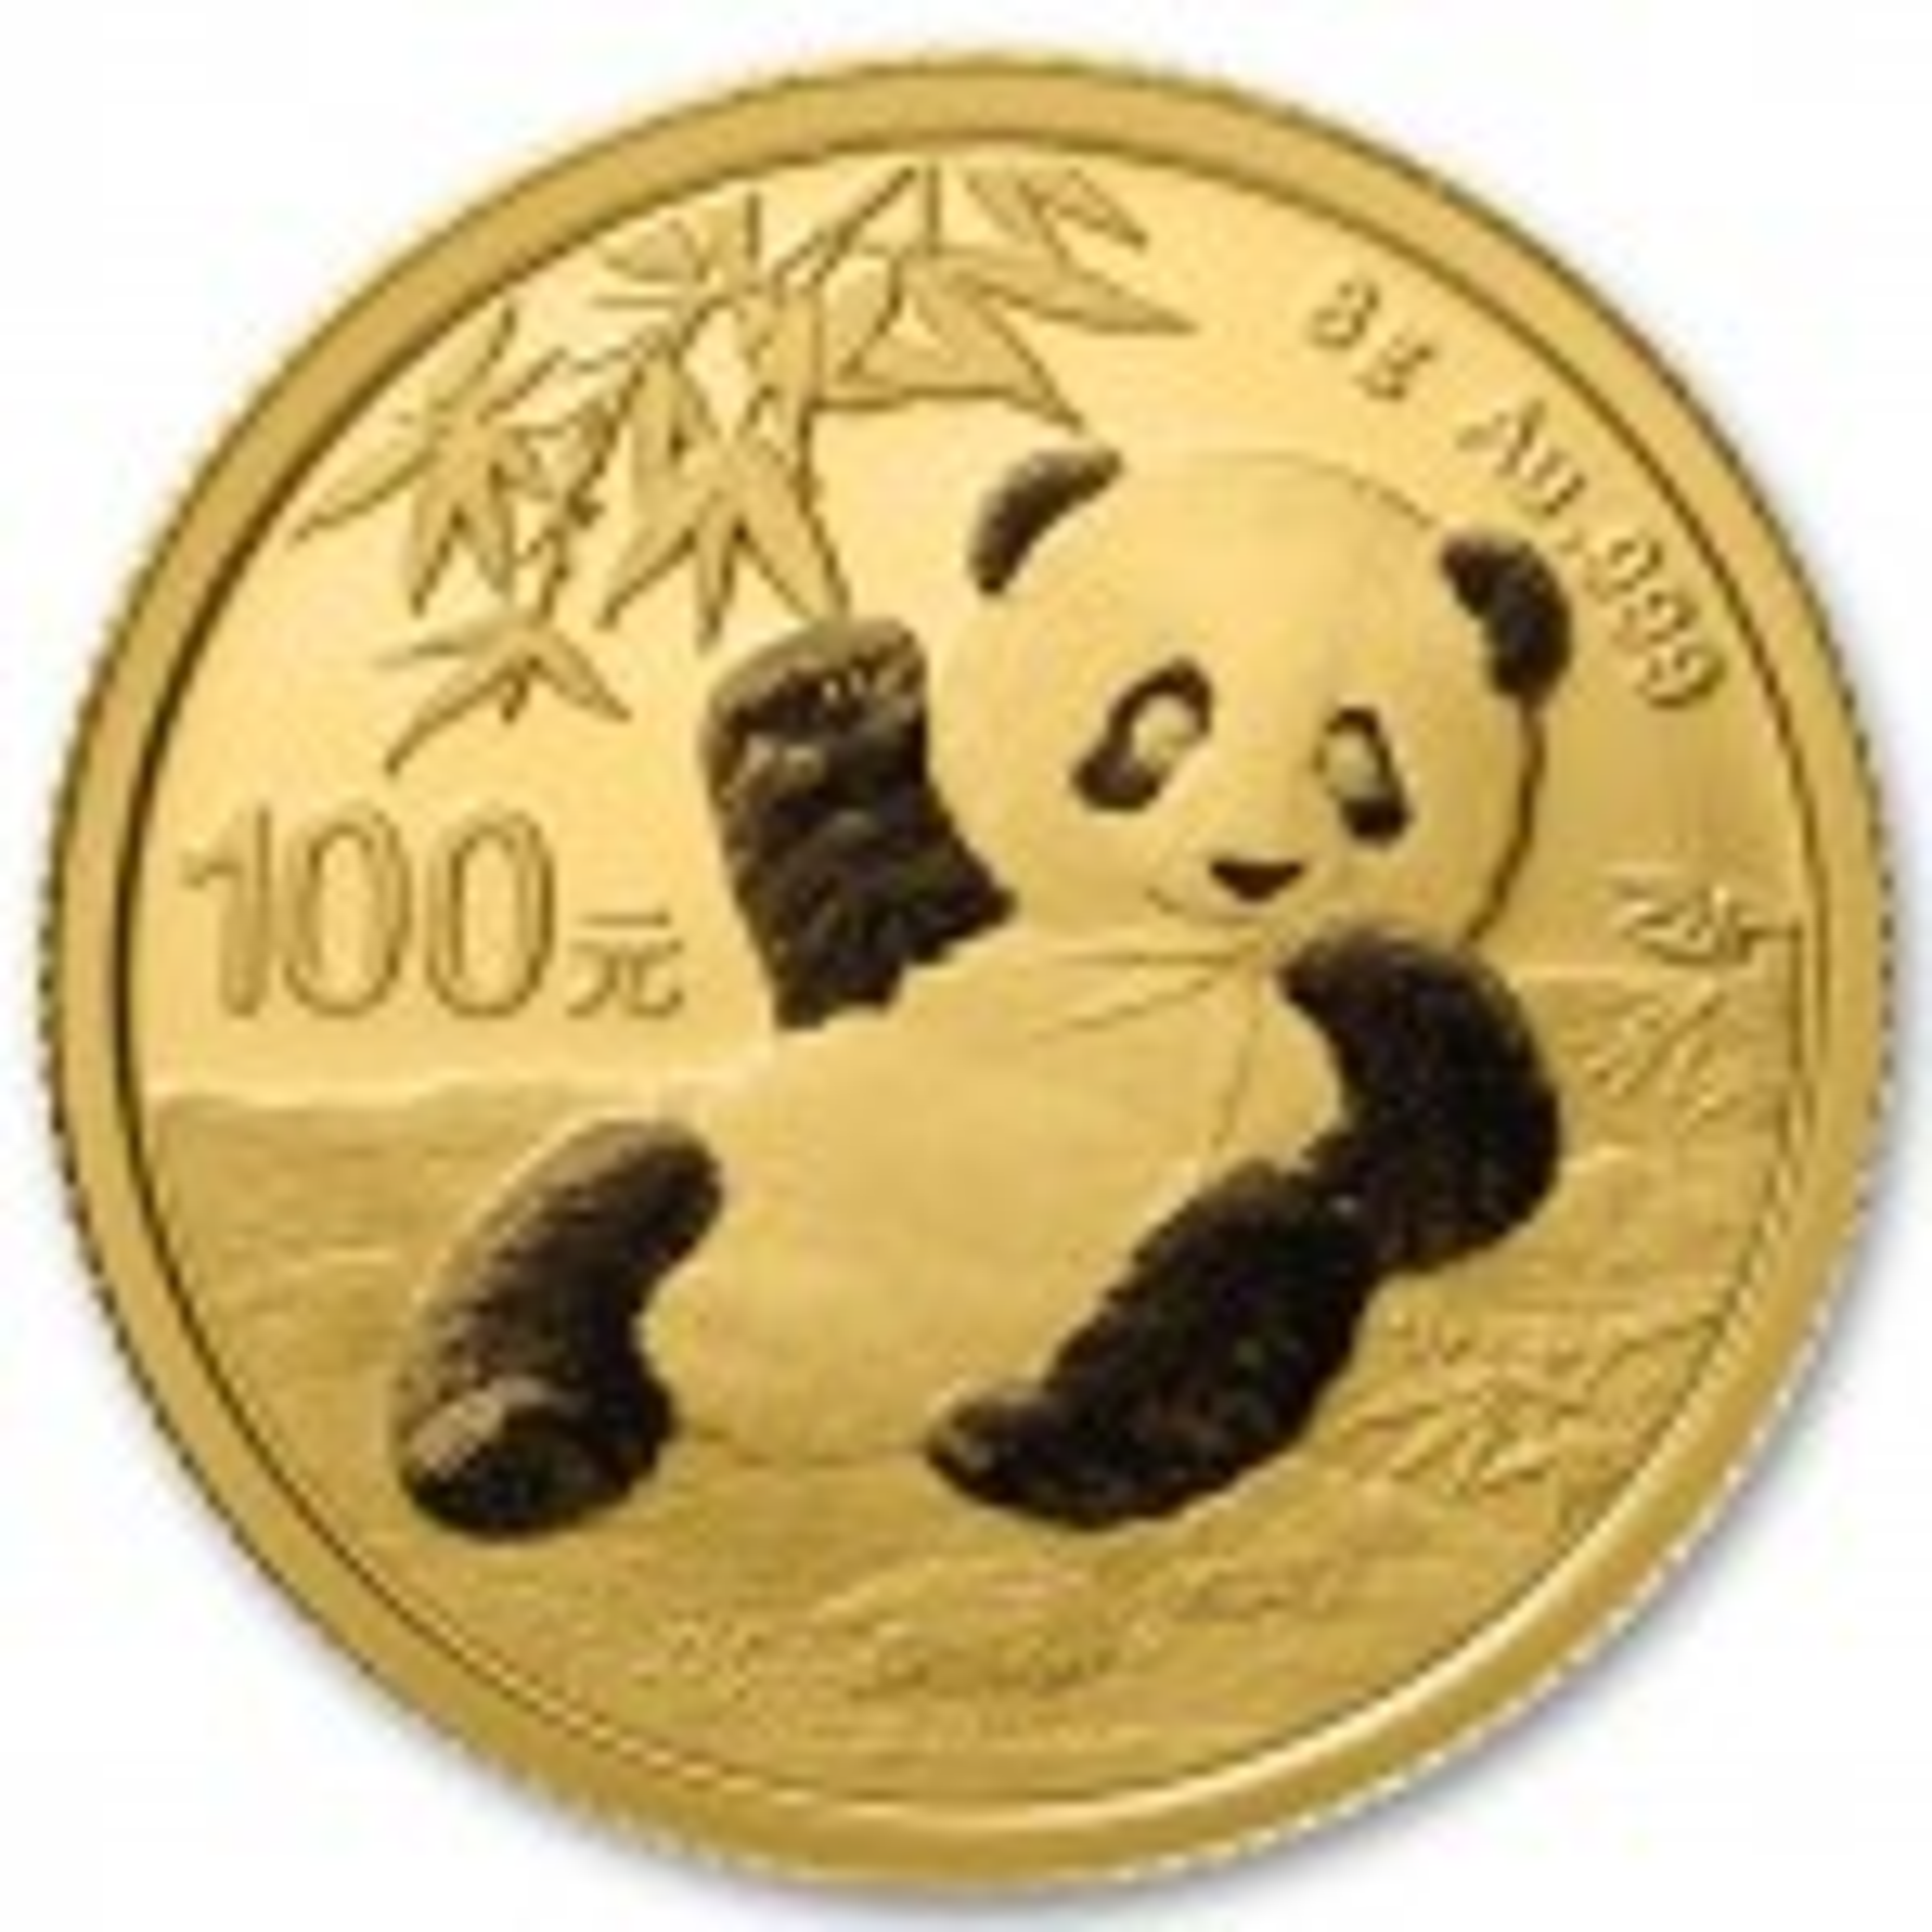 8 Gram gold coin Panda 2020